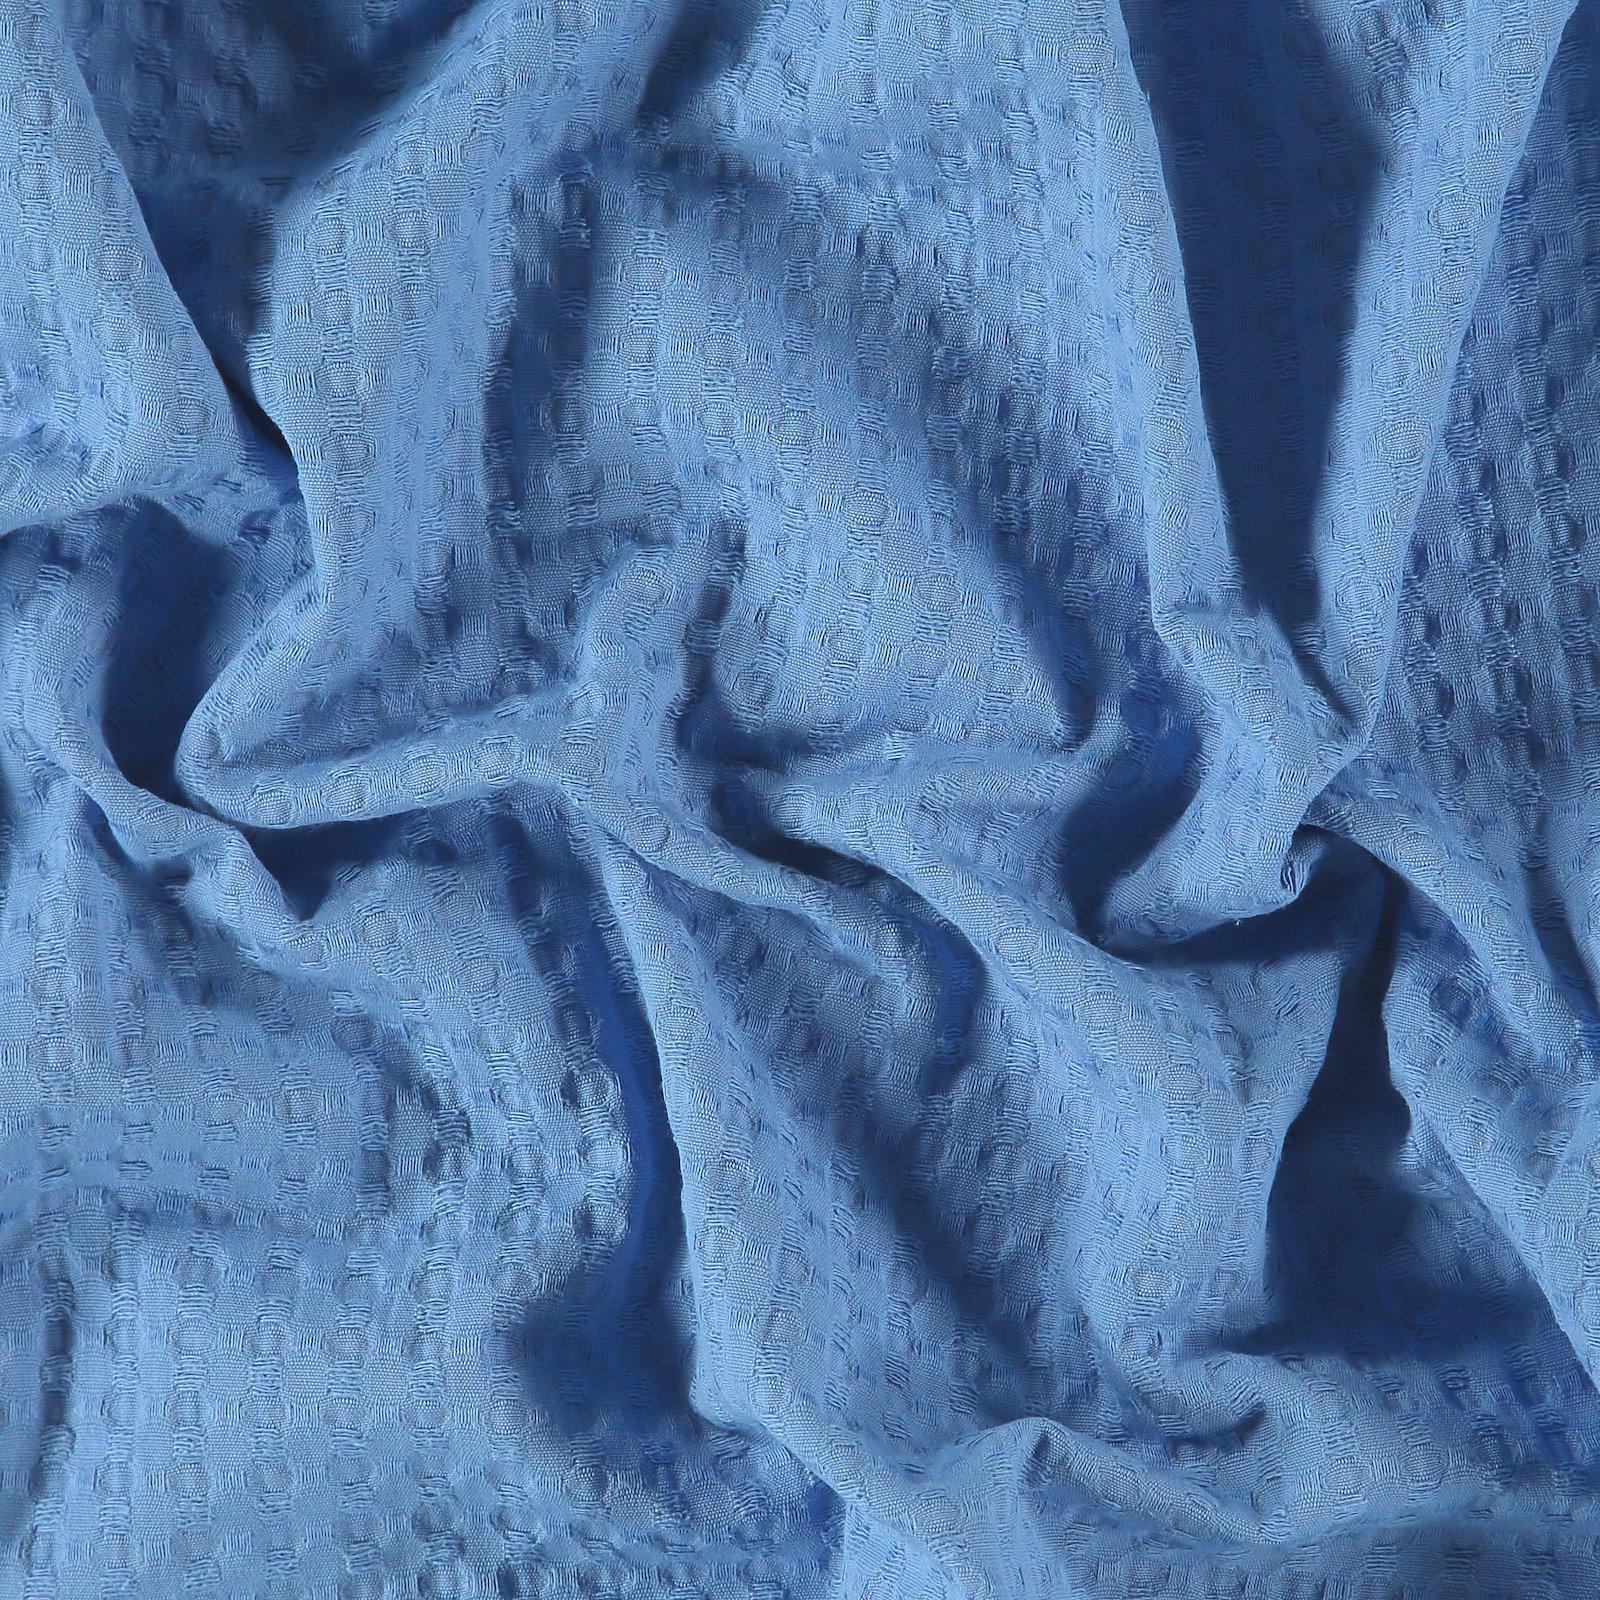 Jacquard gewebt mit Struktur, Kobaltblau